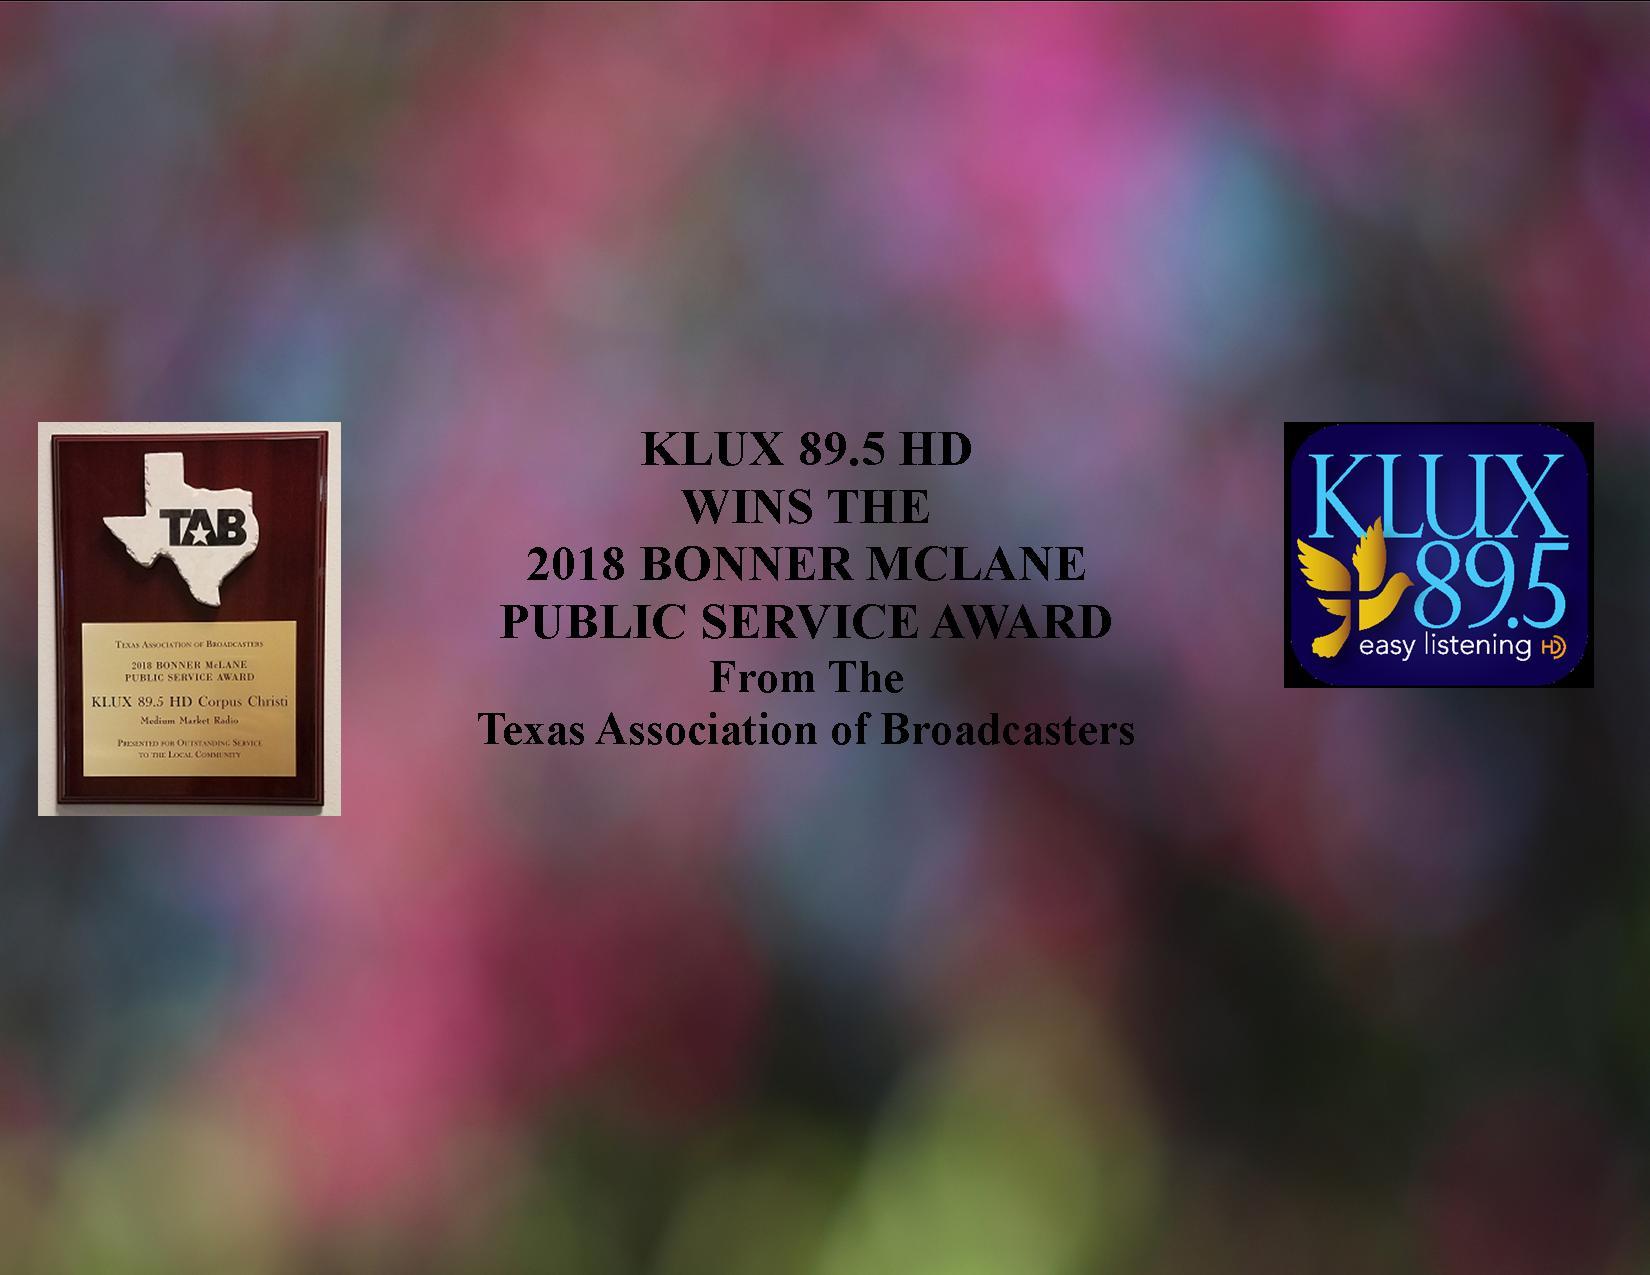 "<div align=""center"">KLUX Wins The 2018 Bonner McLane Service Award</div>"